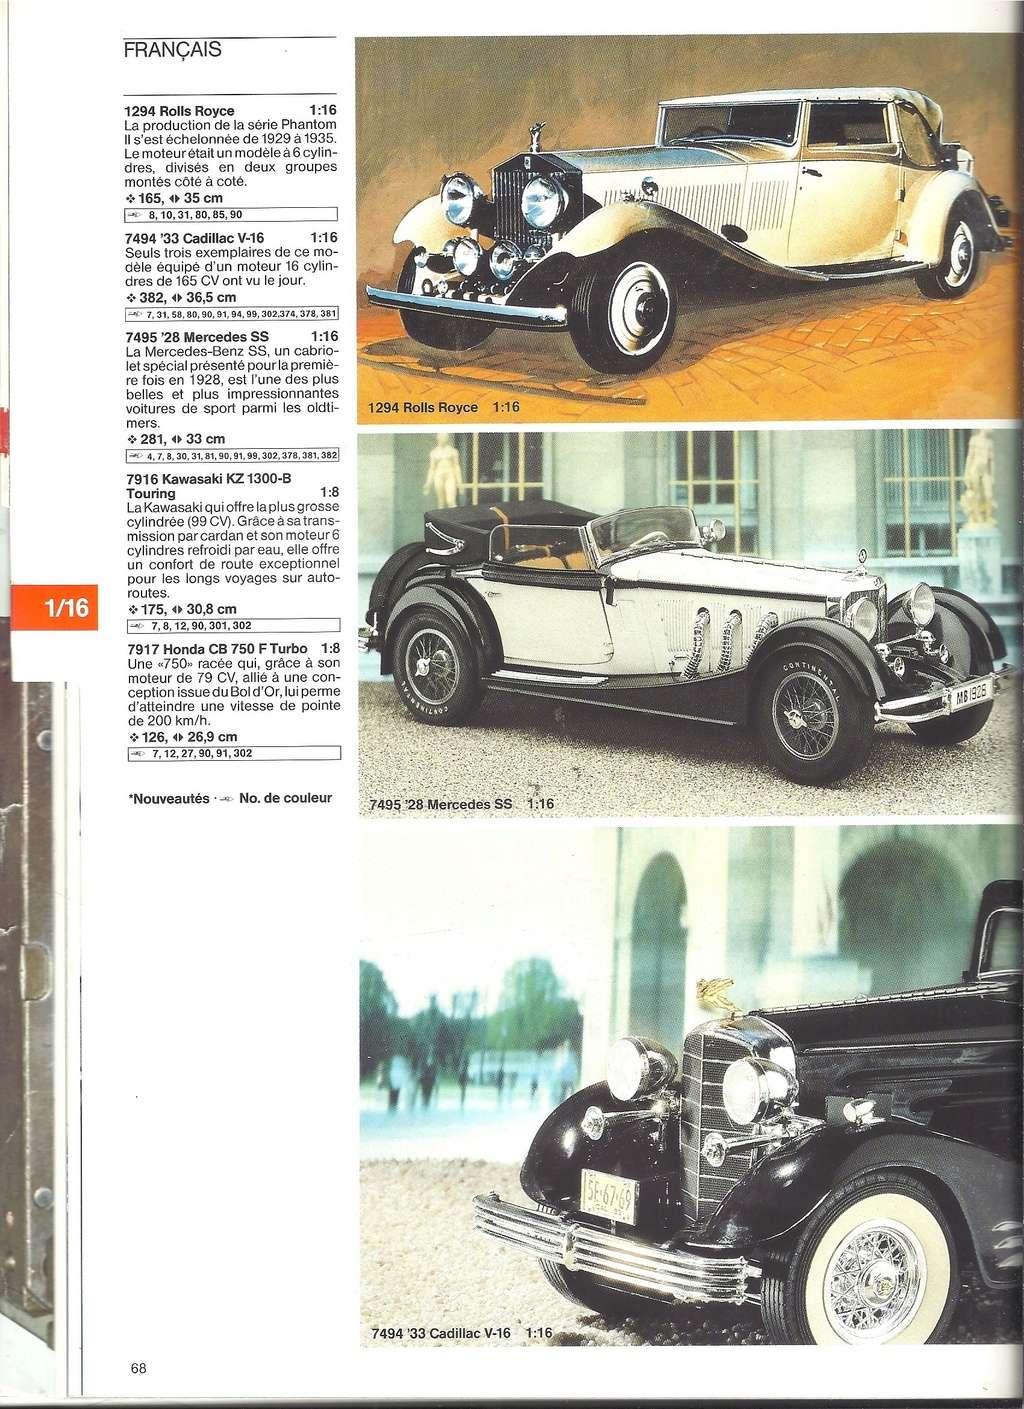 1984 - [REVELL 1984] Catalogue 1984  Revel188